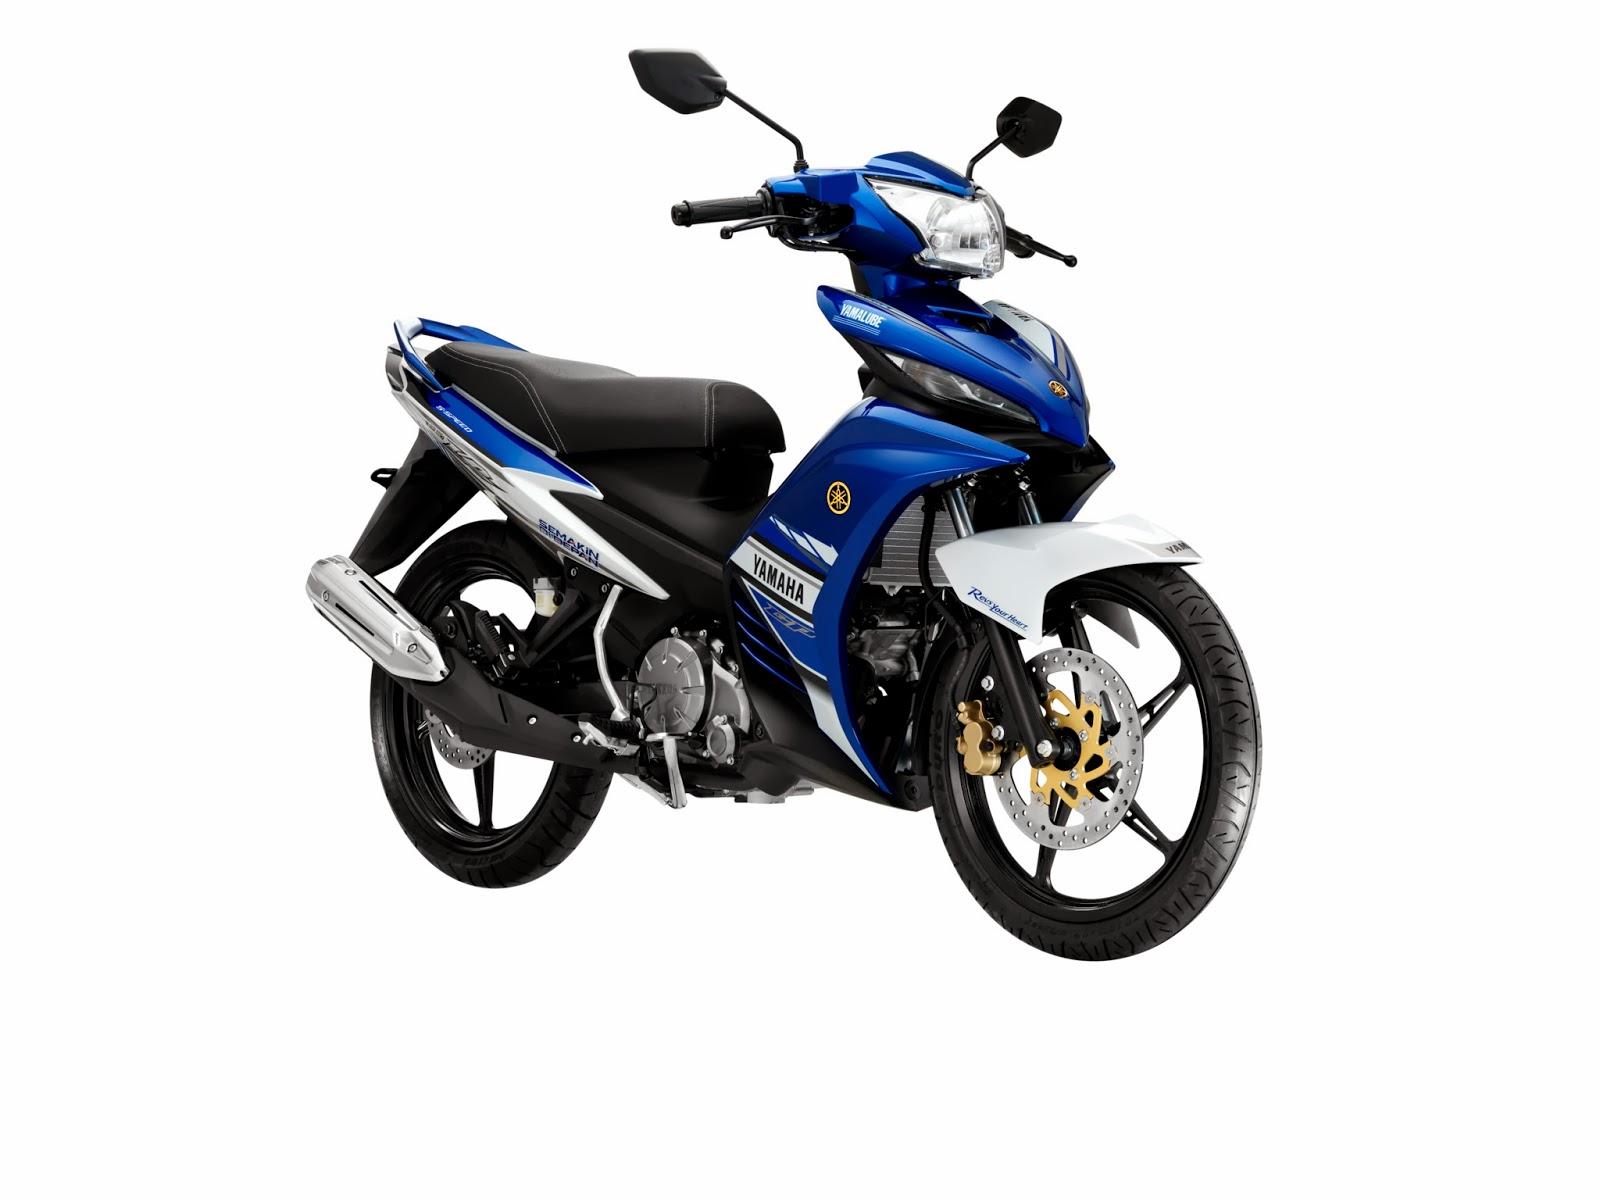 The Story of Legend  Perbandingan Enjin antara Yamaha FZ150i